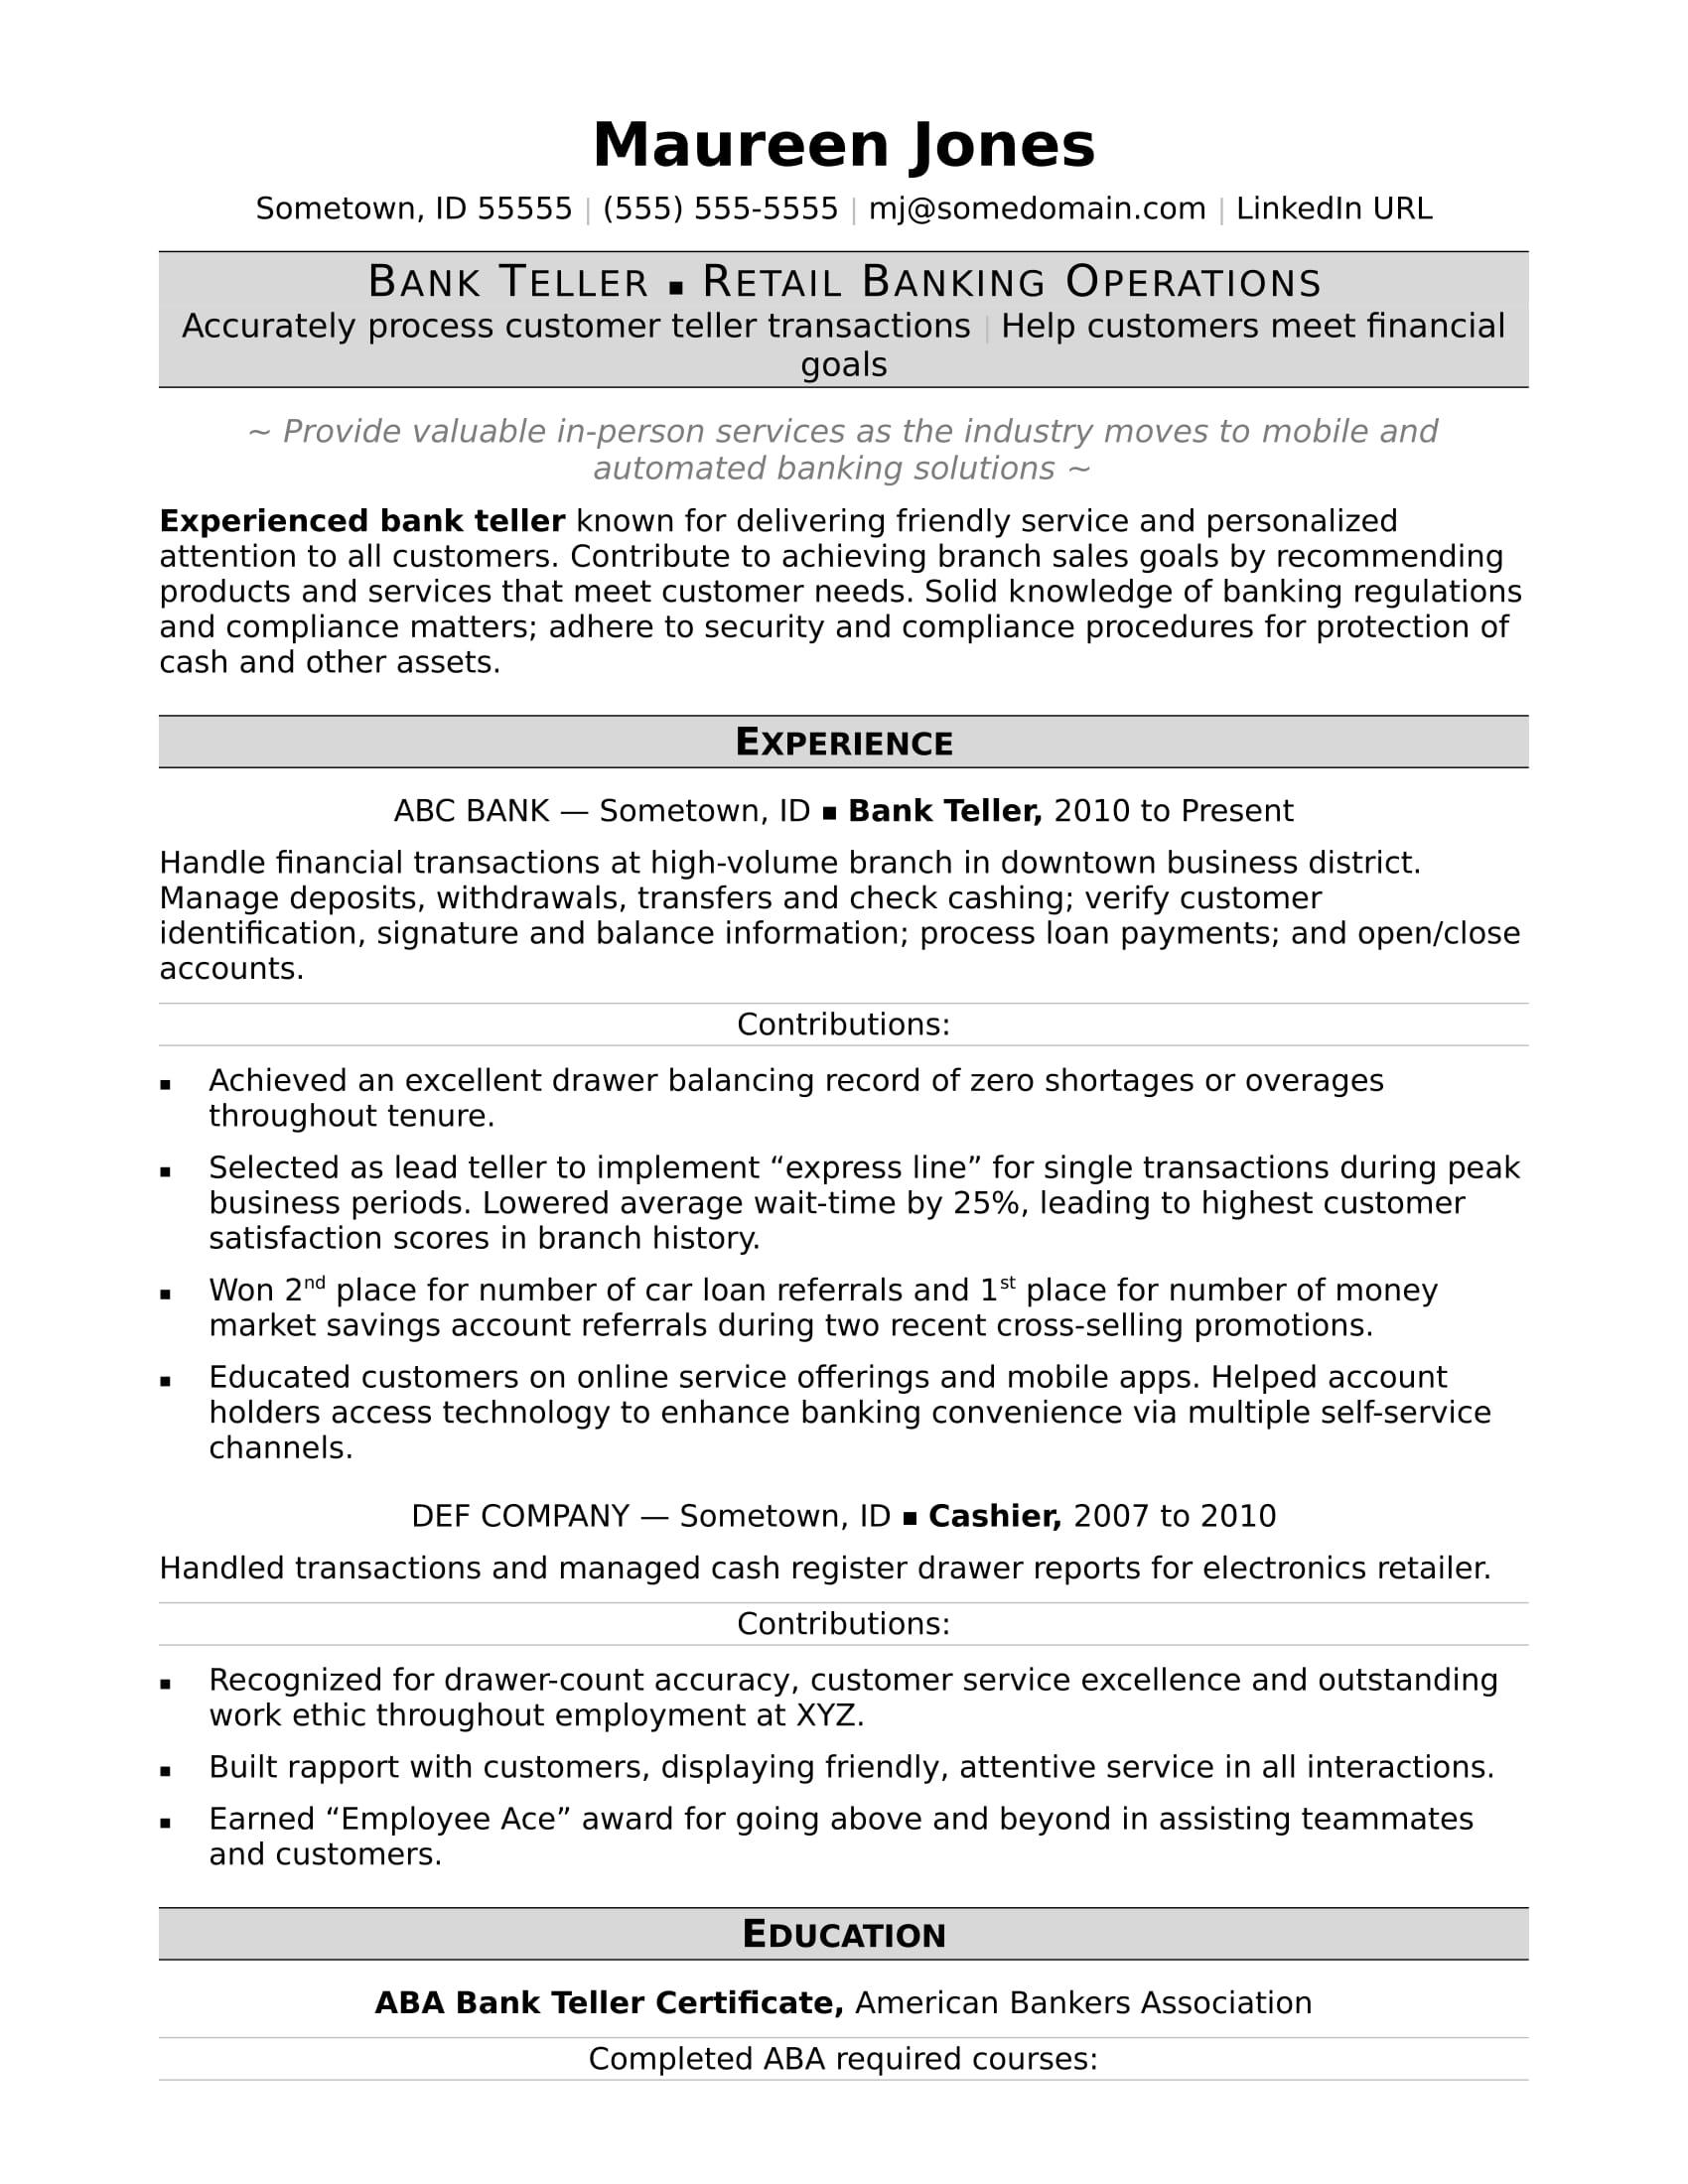 resume examples bank teller